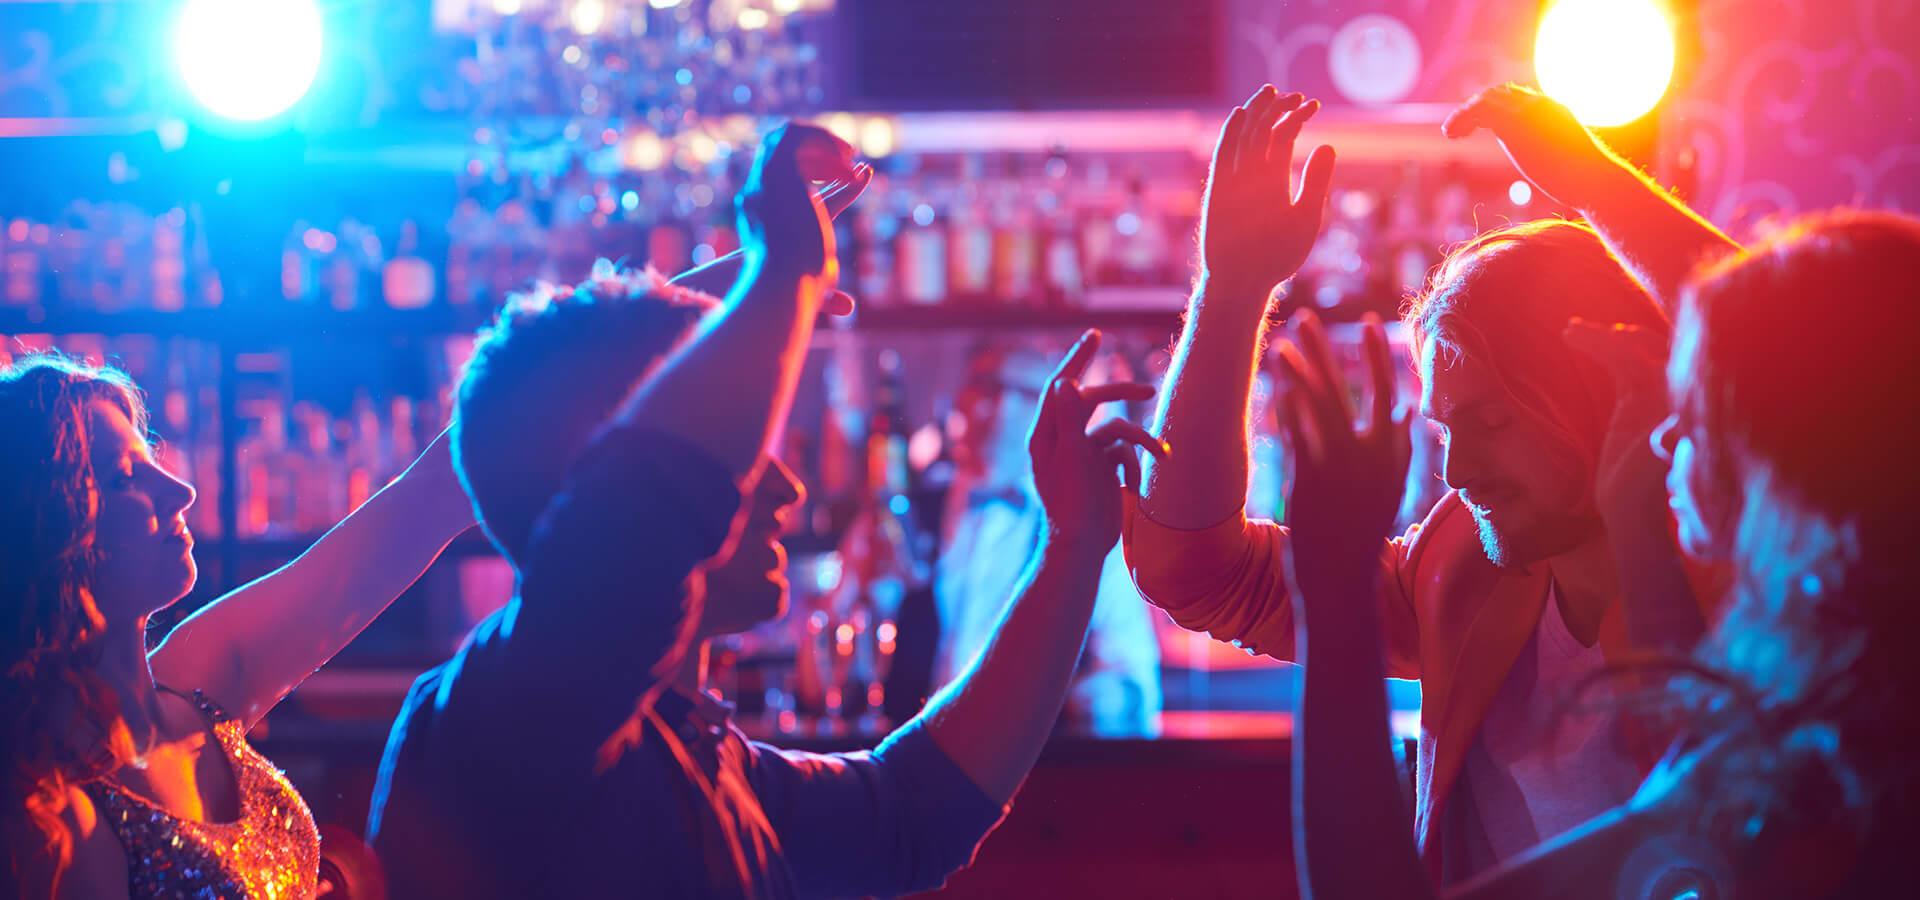 drinks-dancing-fun.jpg